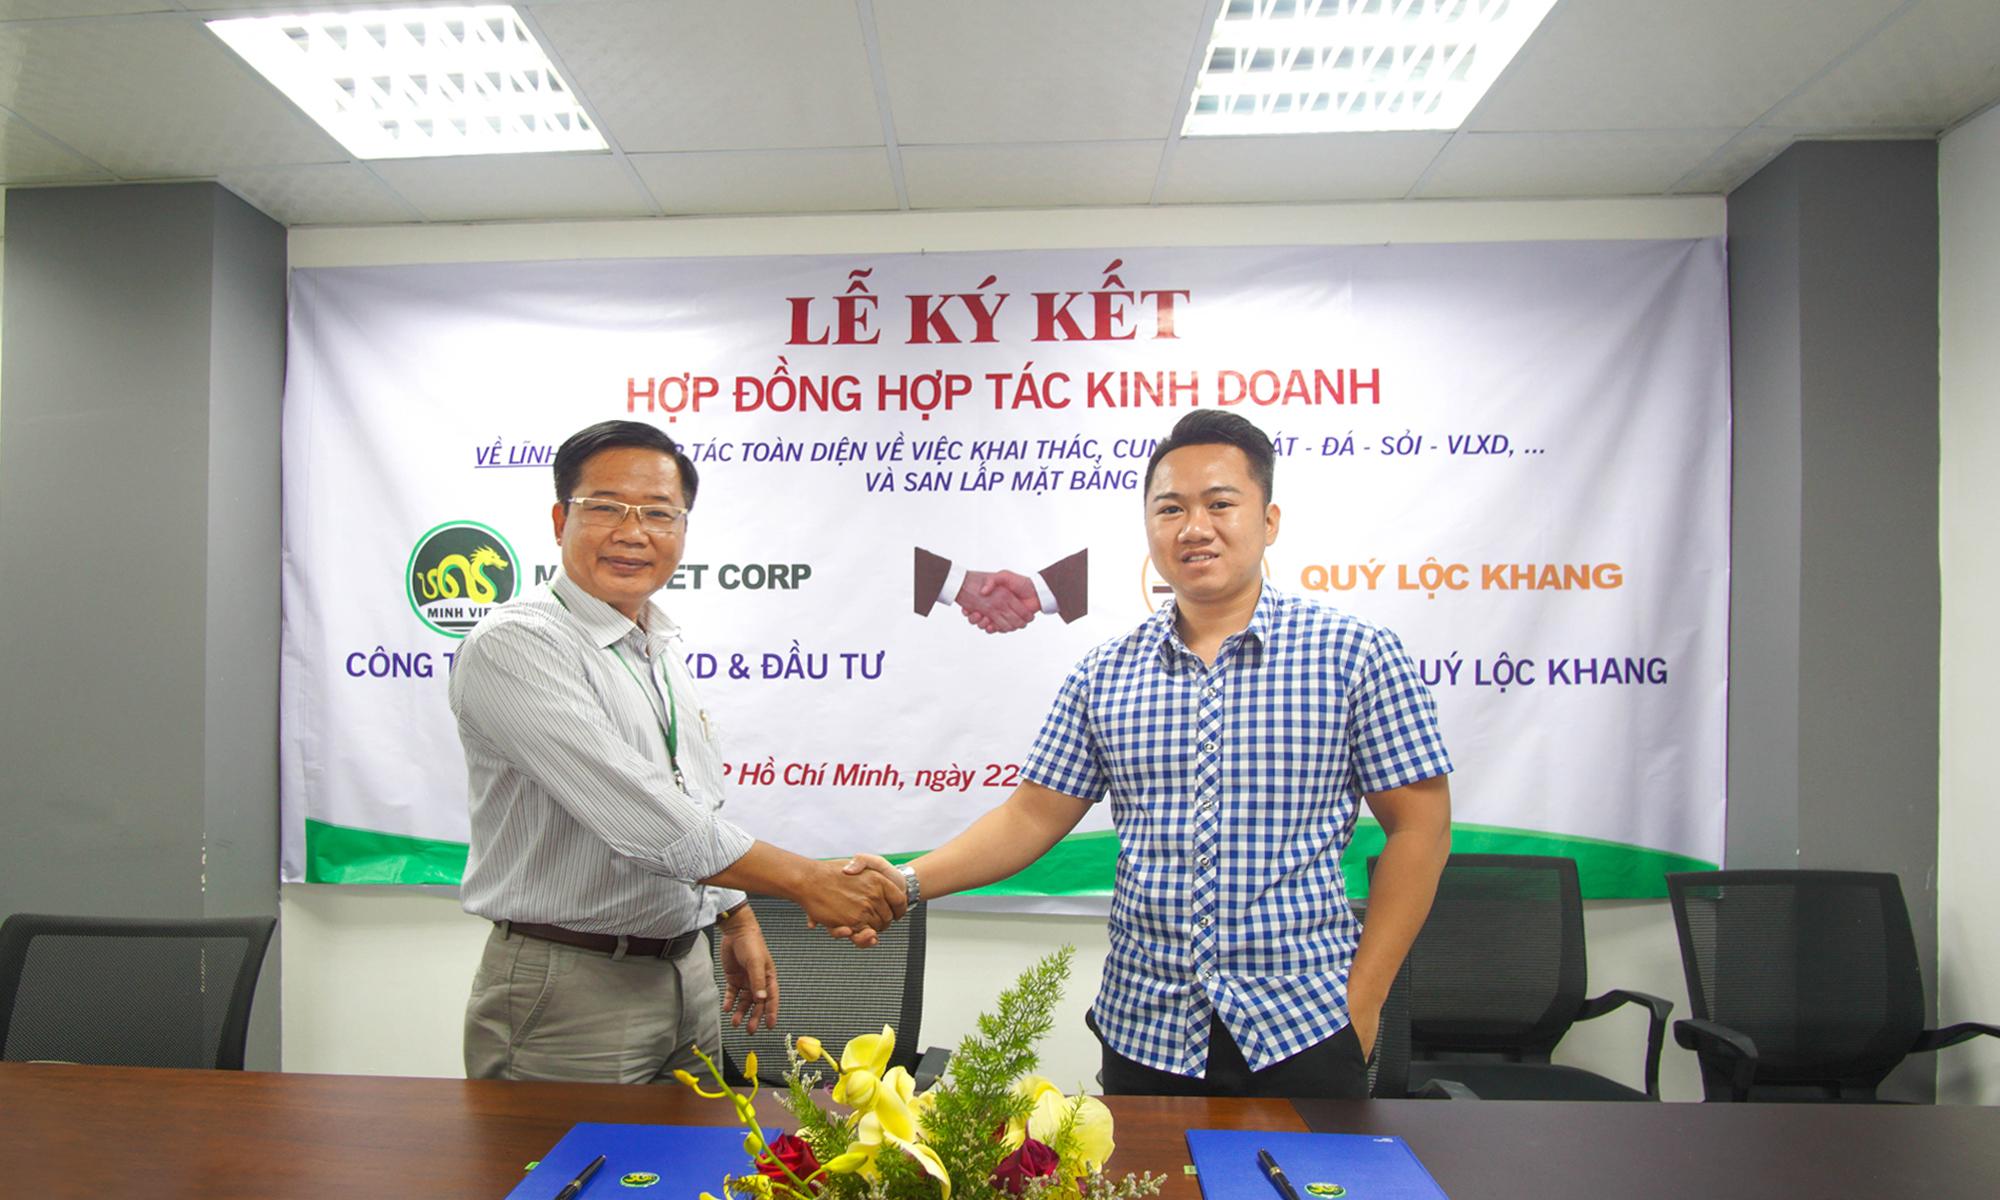 le-ky-ket-quy-loc-khang2